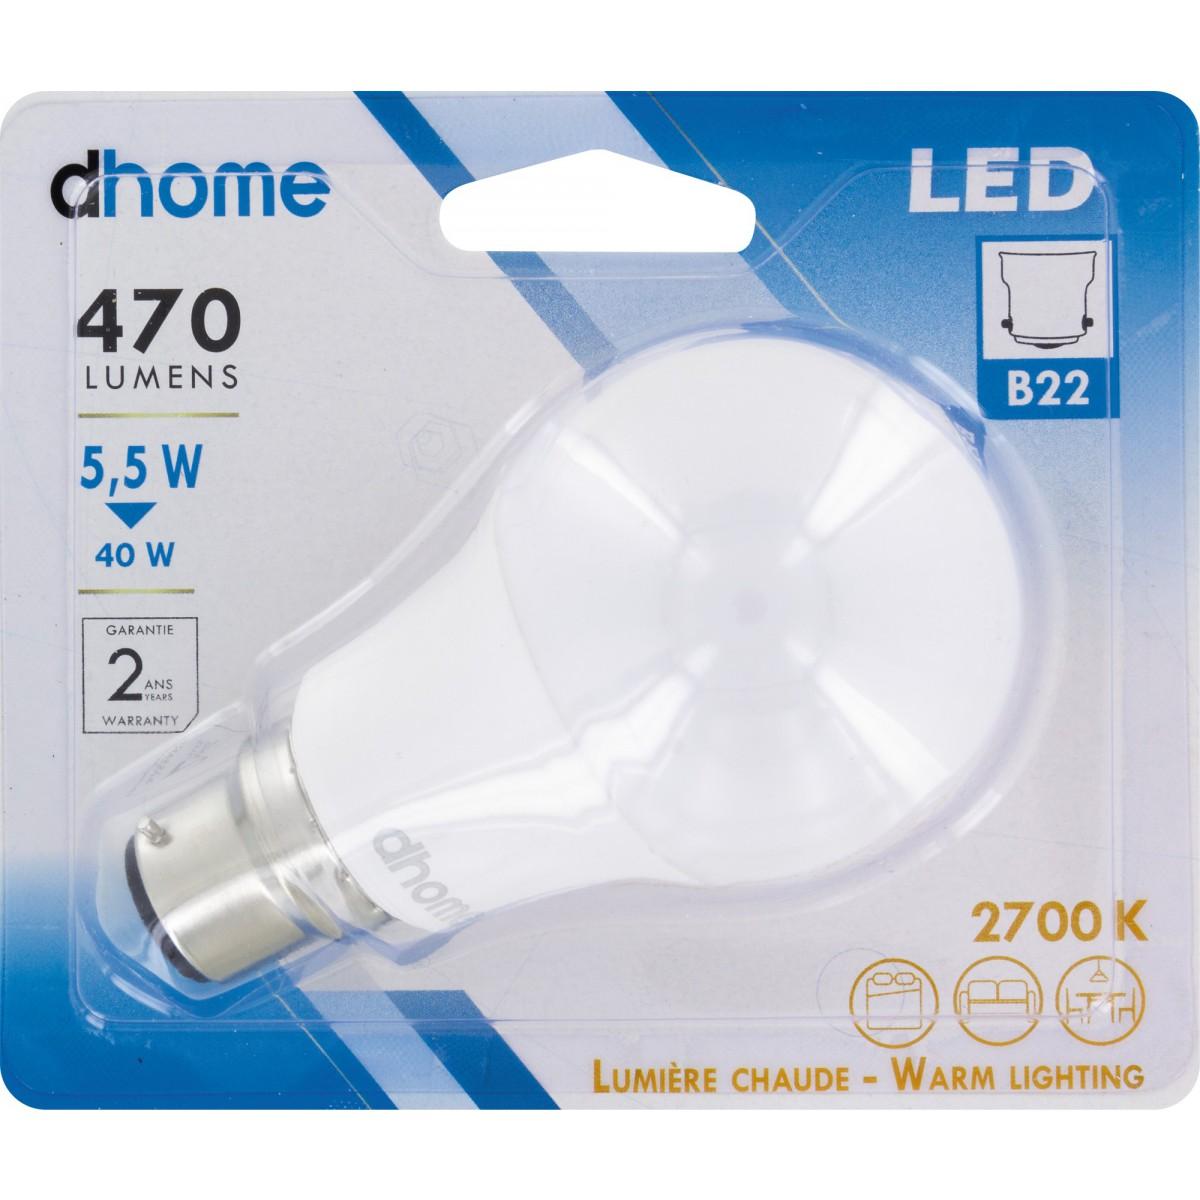 Ampoule LED standard B22 dhome - 470 Lumens - 5,5 W - 2700 K